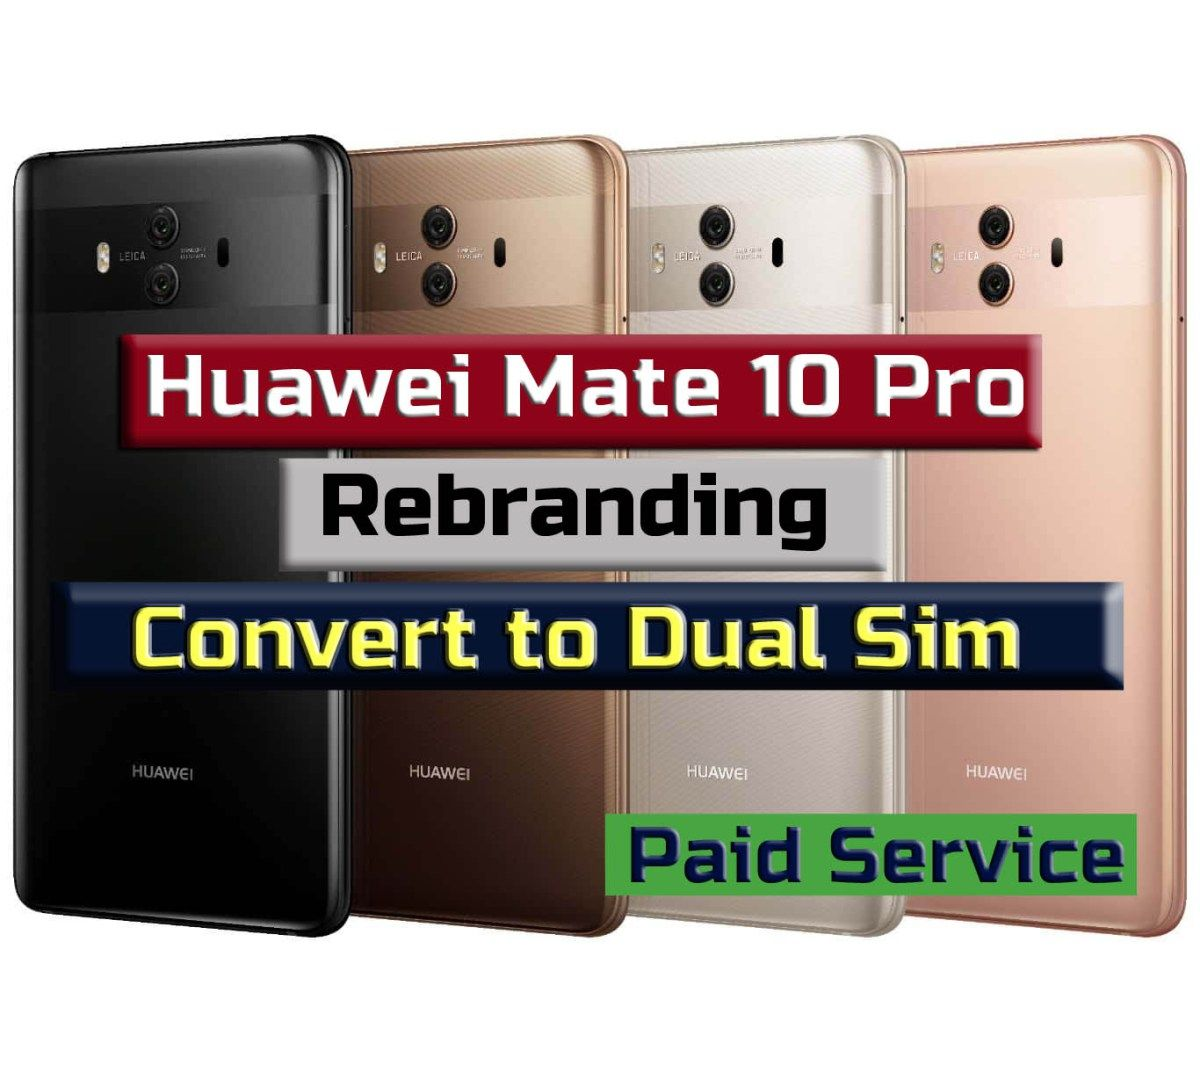 Huawei Mate 10 Pro Rebranding (Convert to Dual Sim)(Chinese to